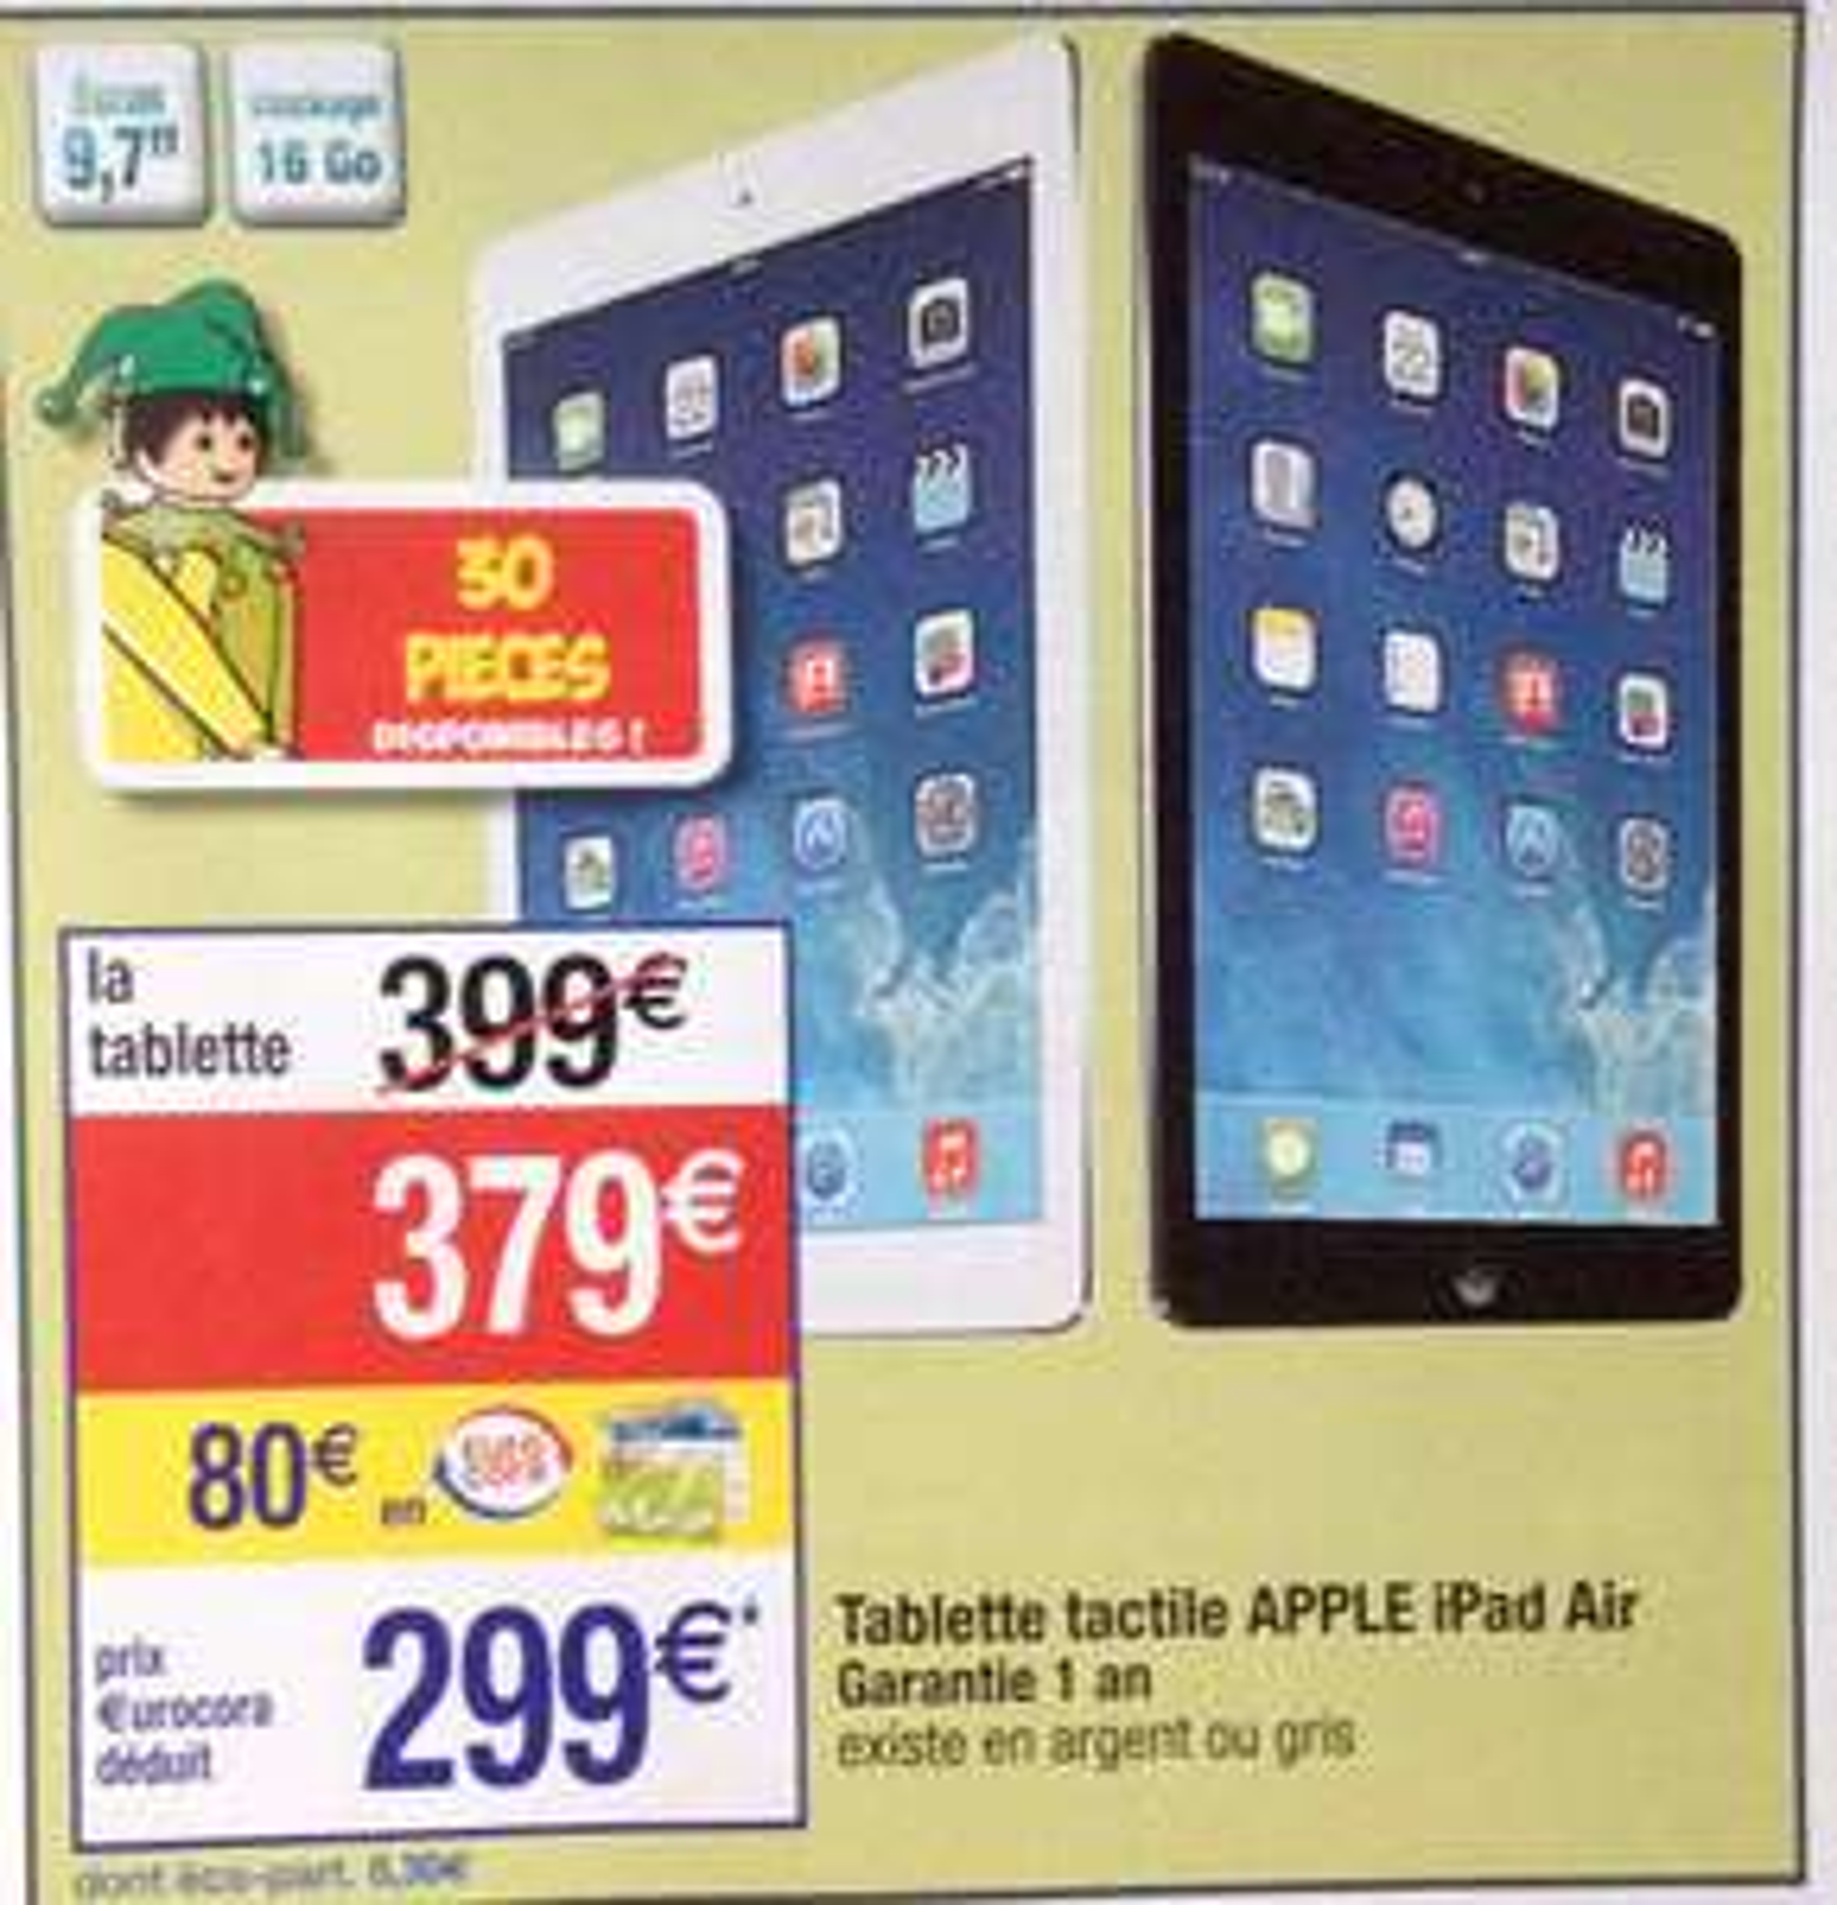 Tablette Apple iPad Air - 16 Go (avec 80€ en €urocora)